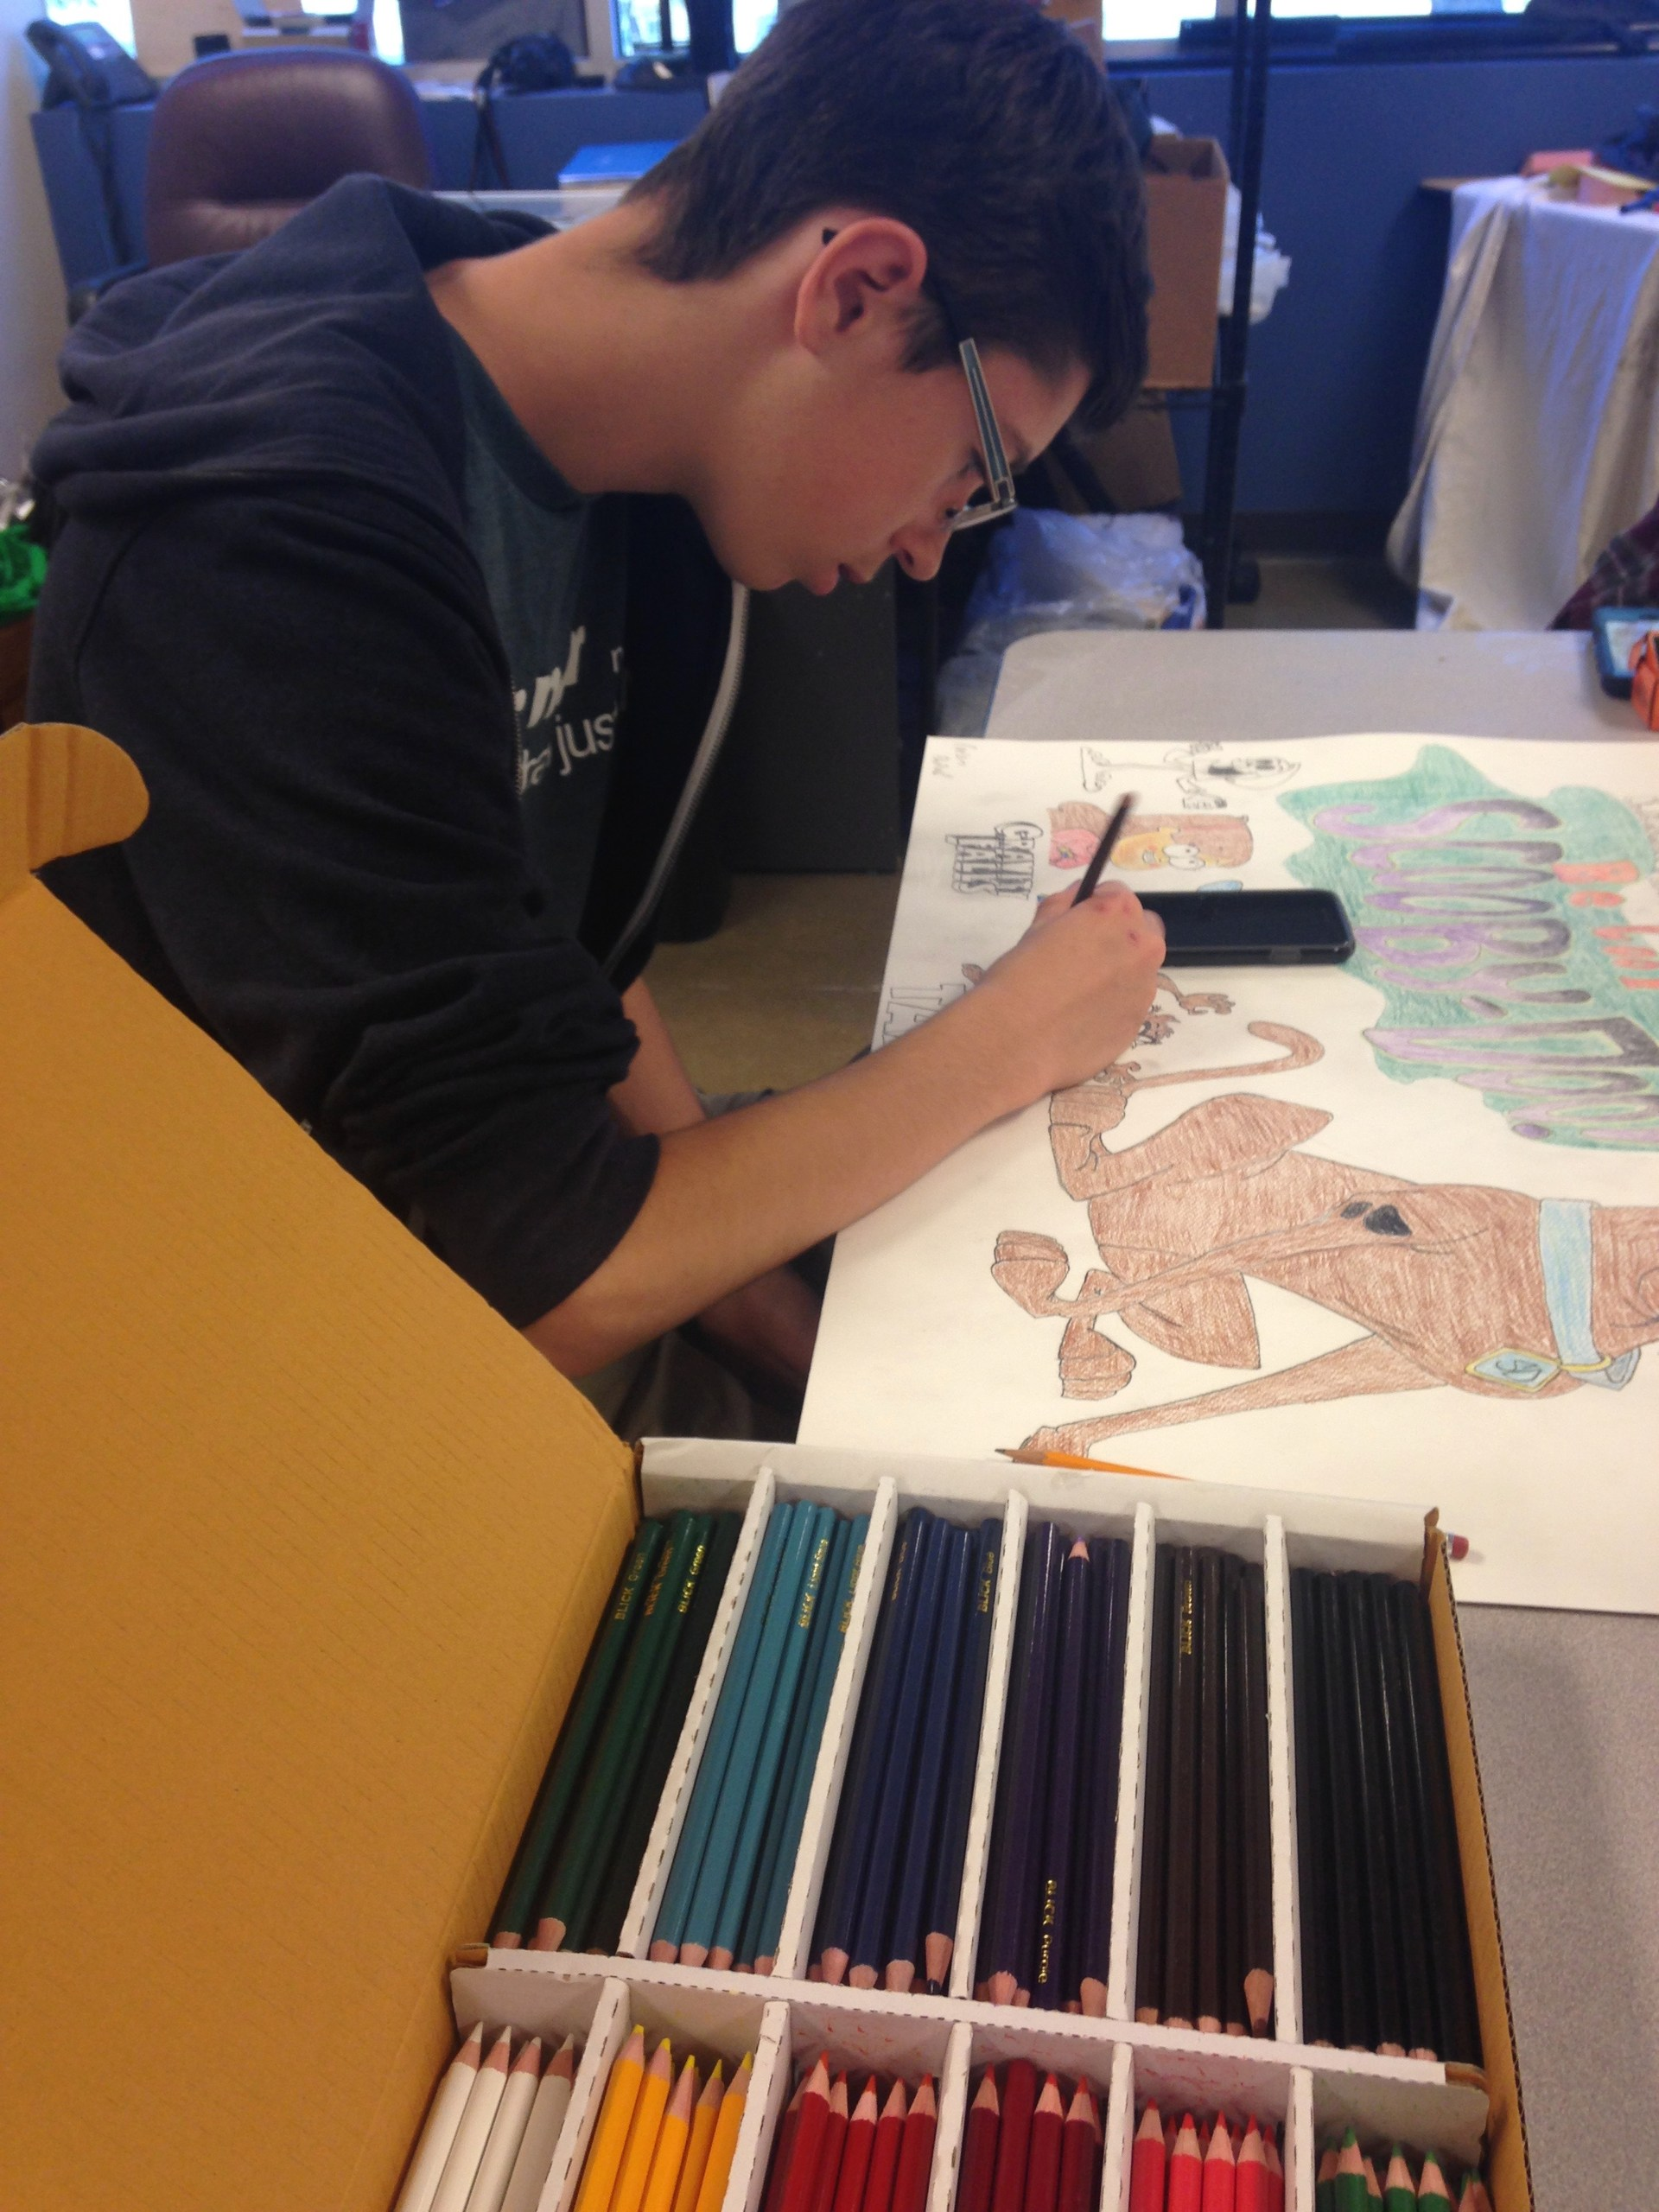 student working on art